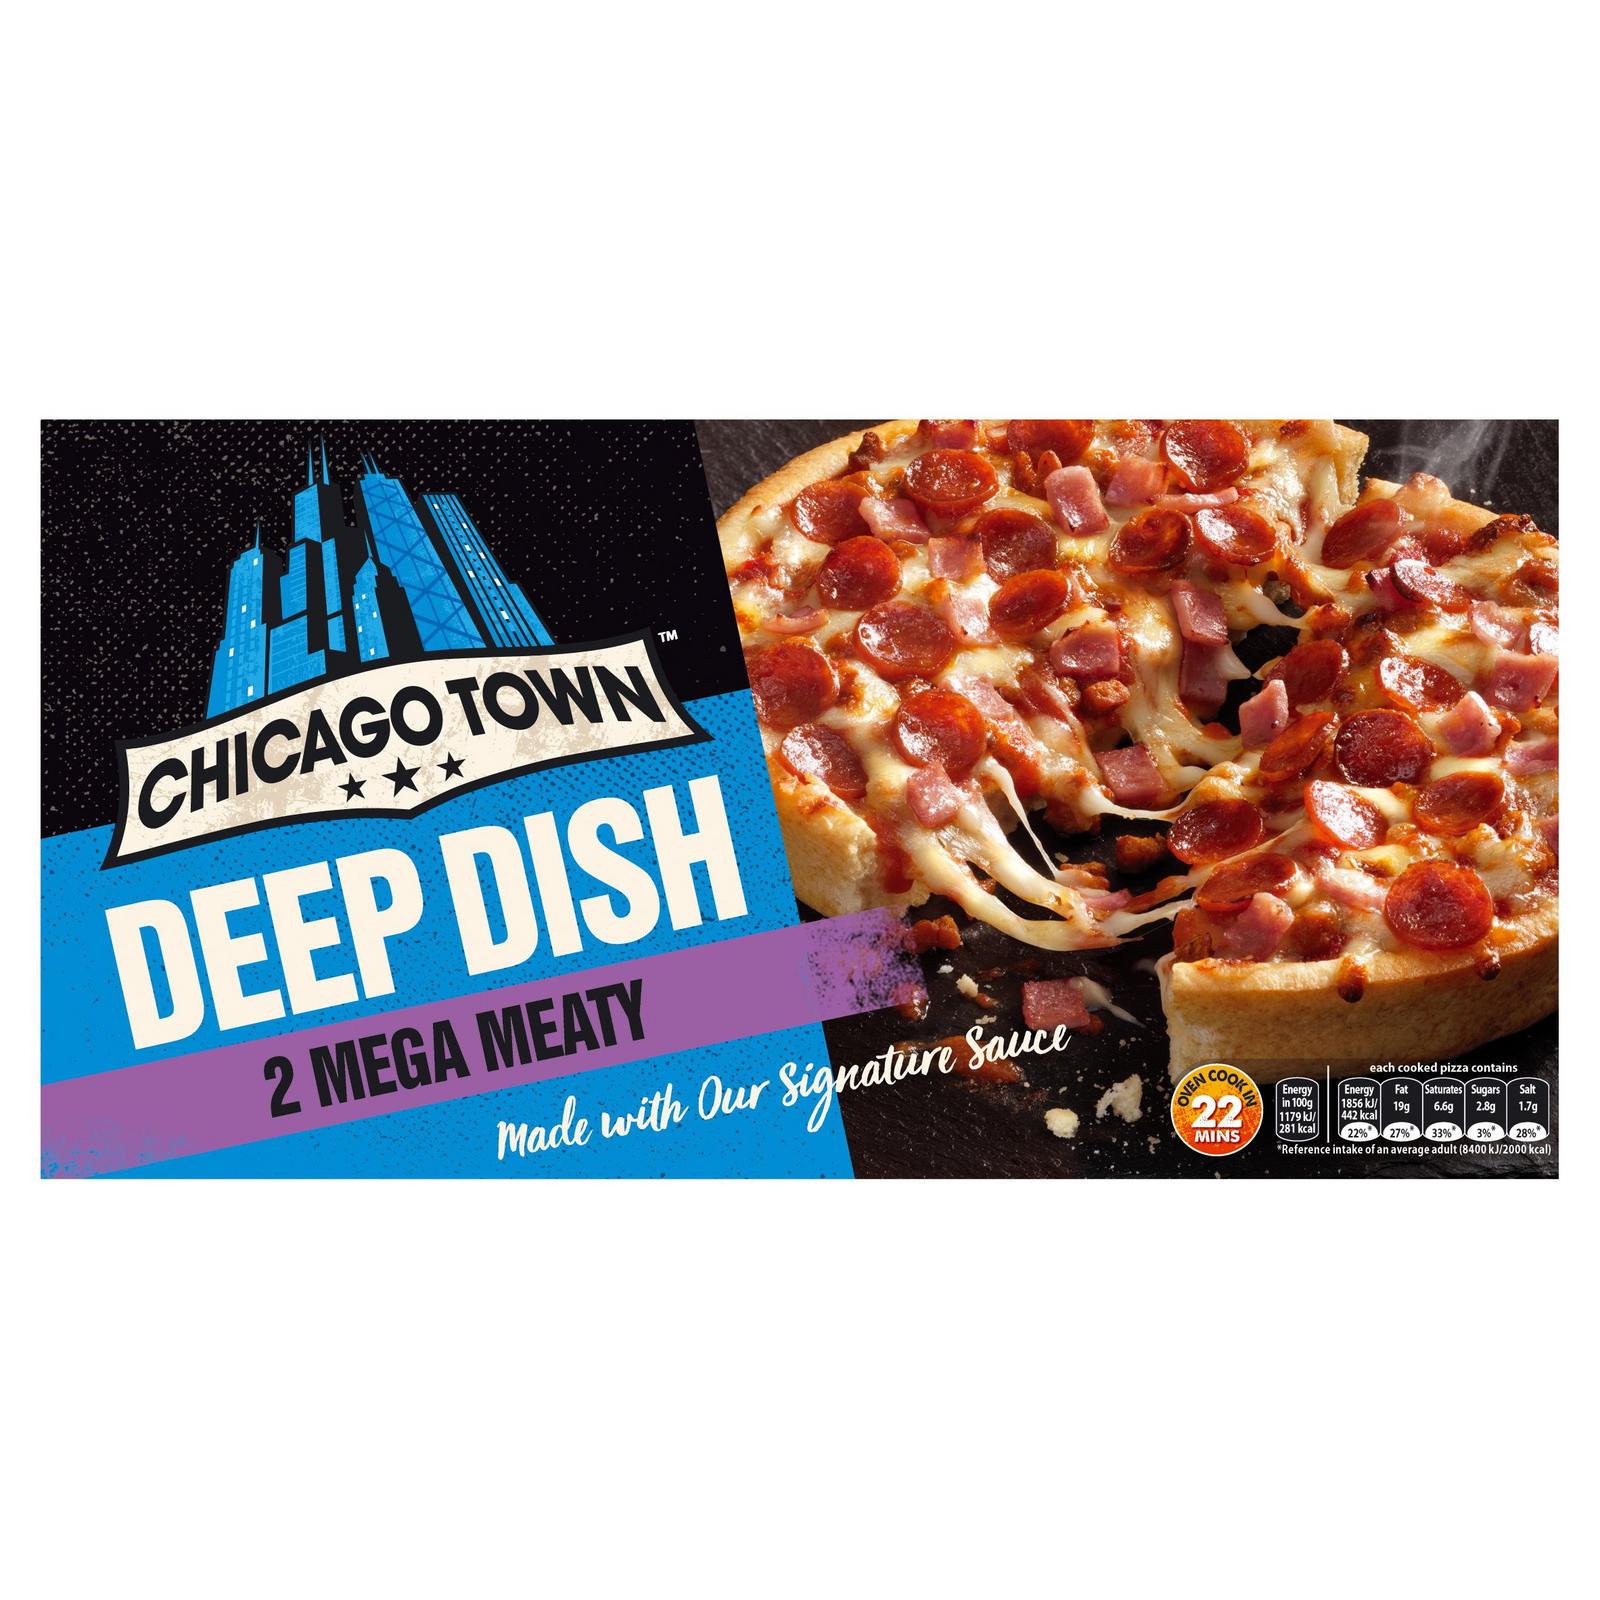 Chicago Town 2 Deep Dish Mega Meaty Pizzas (320g) | Deep Pan